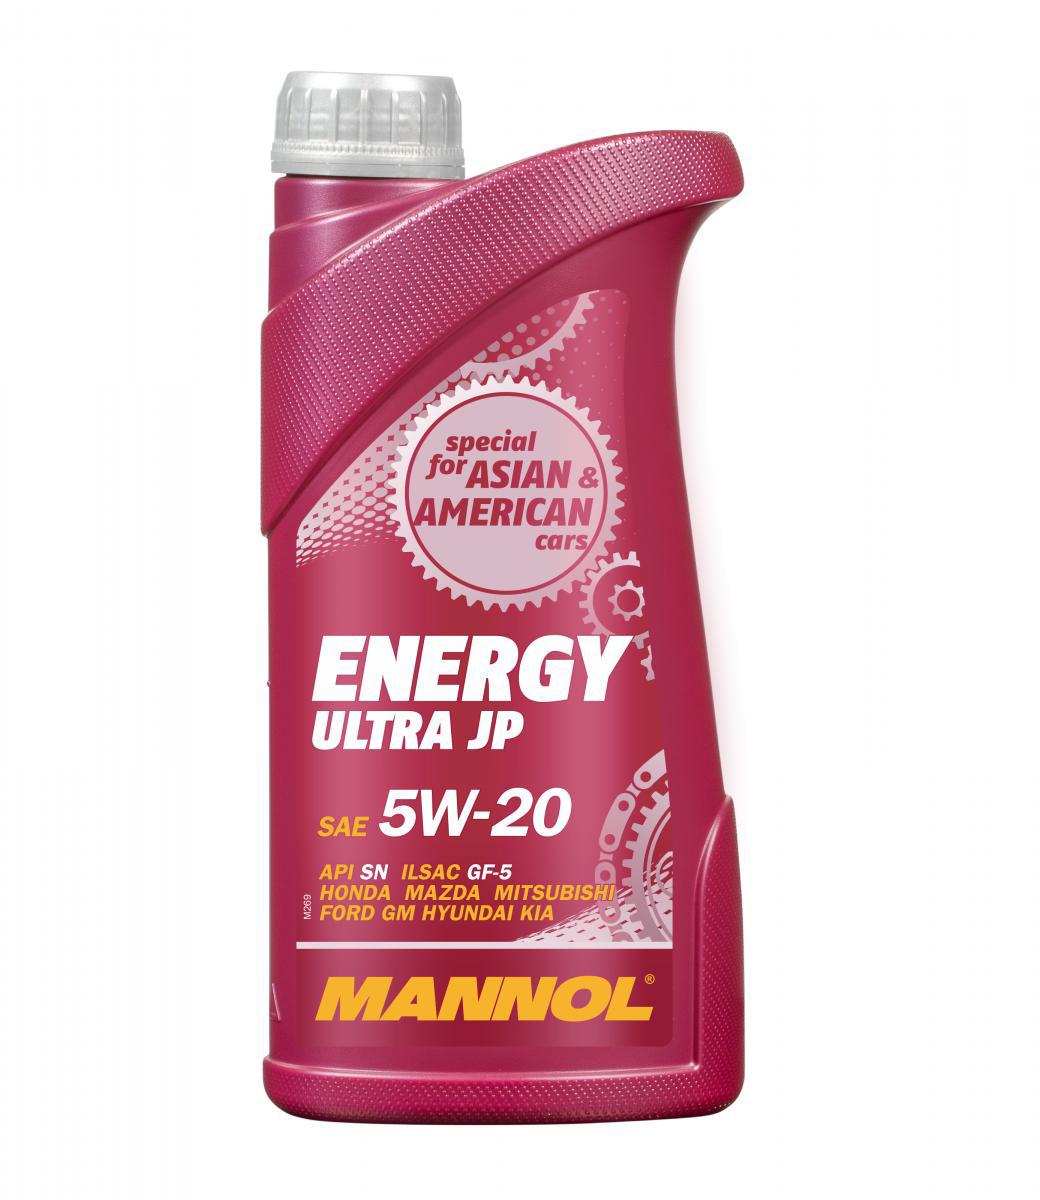 Energy Ultra JP 5W-20